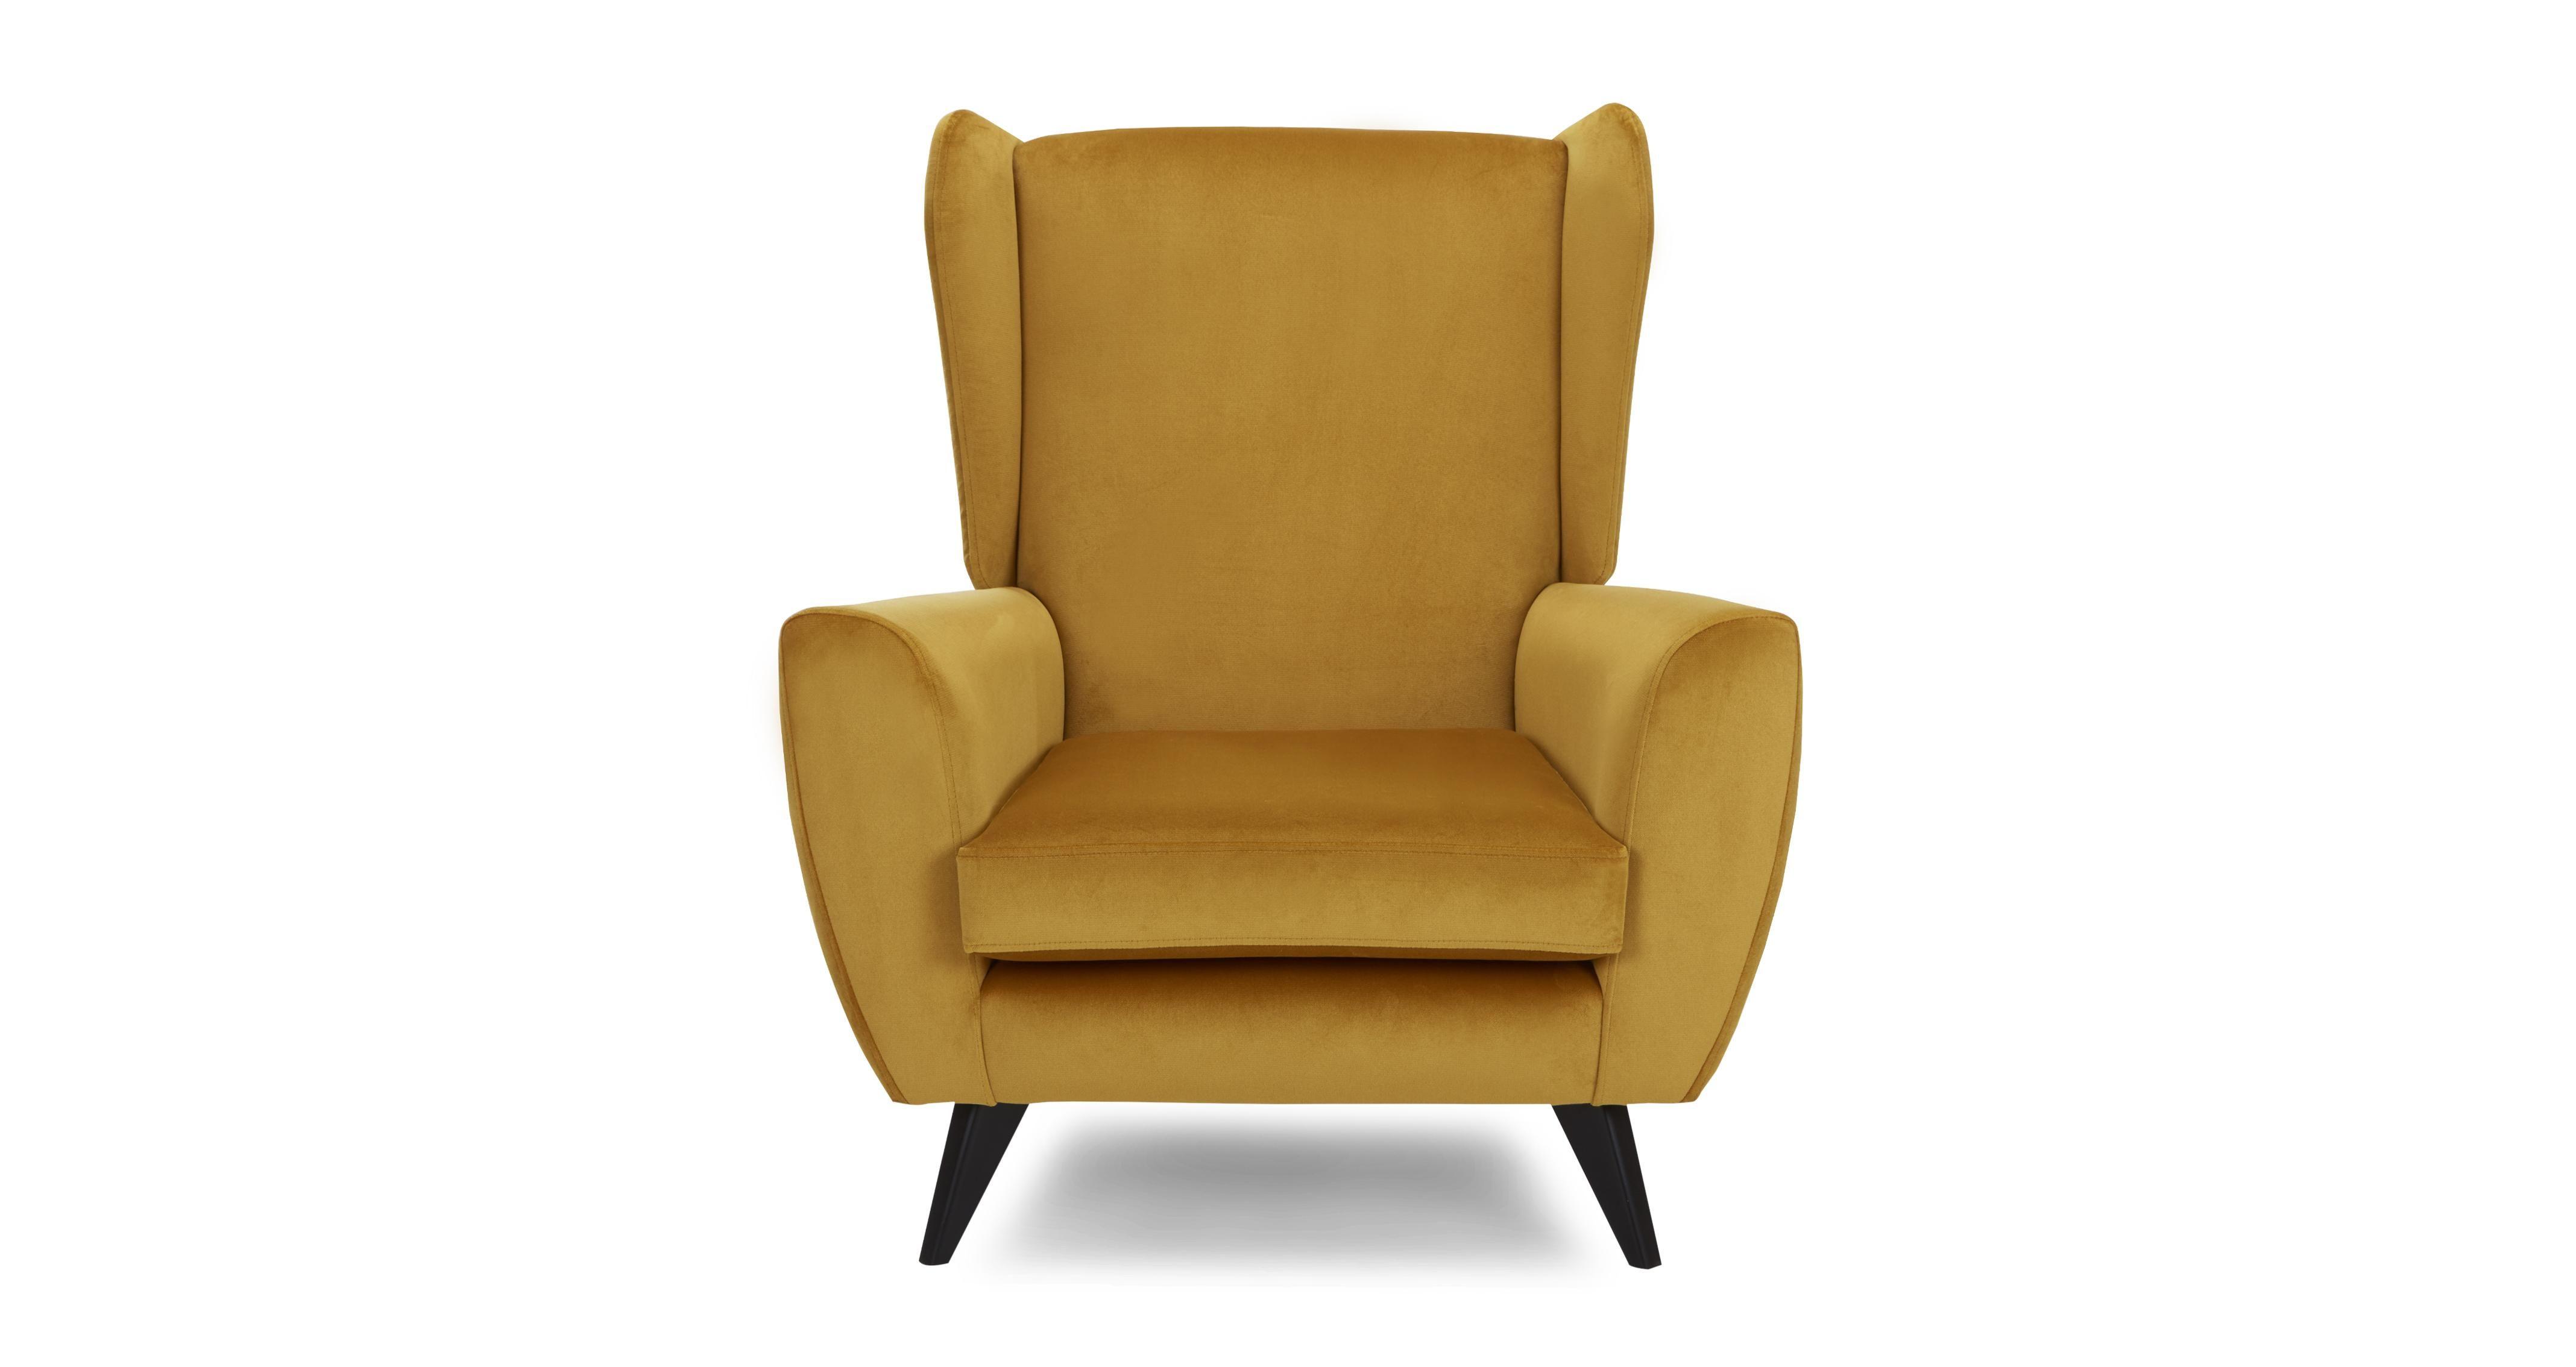 Dfs Accent Chair Calm In 2020 Wing Chair Chair Chair Fabric